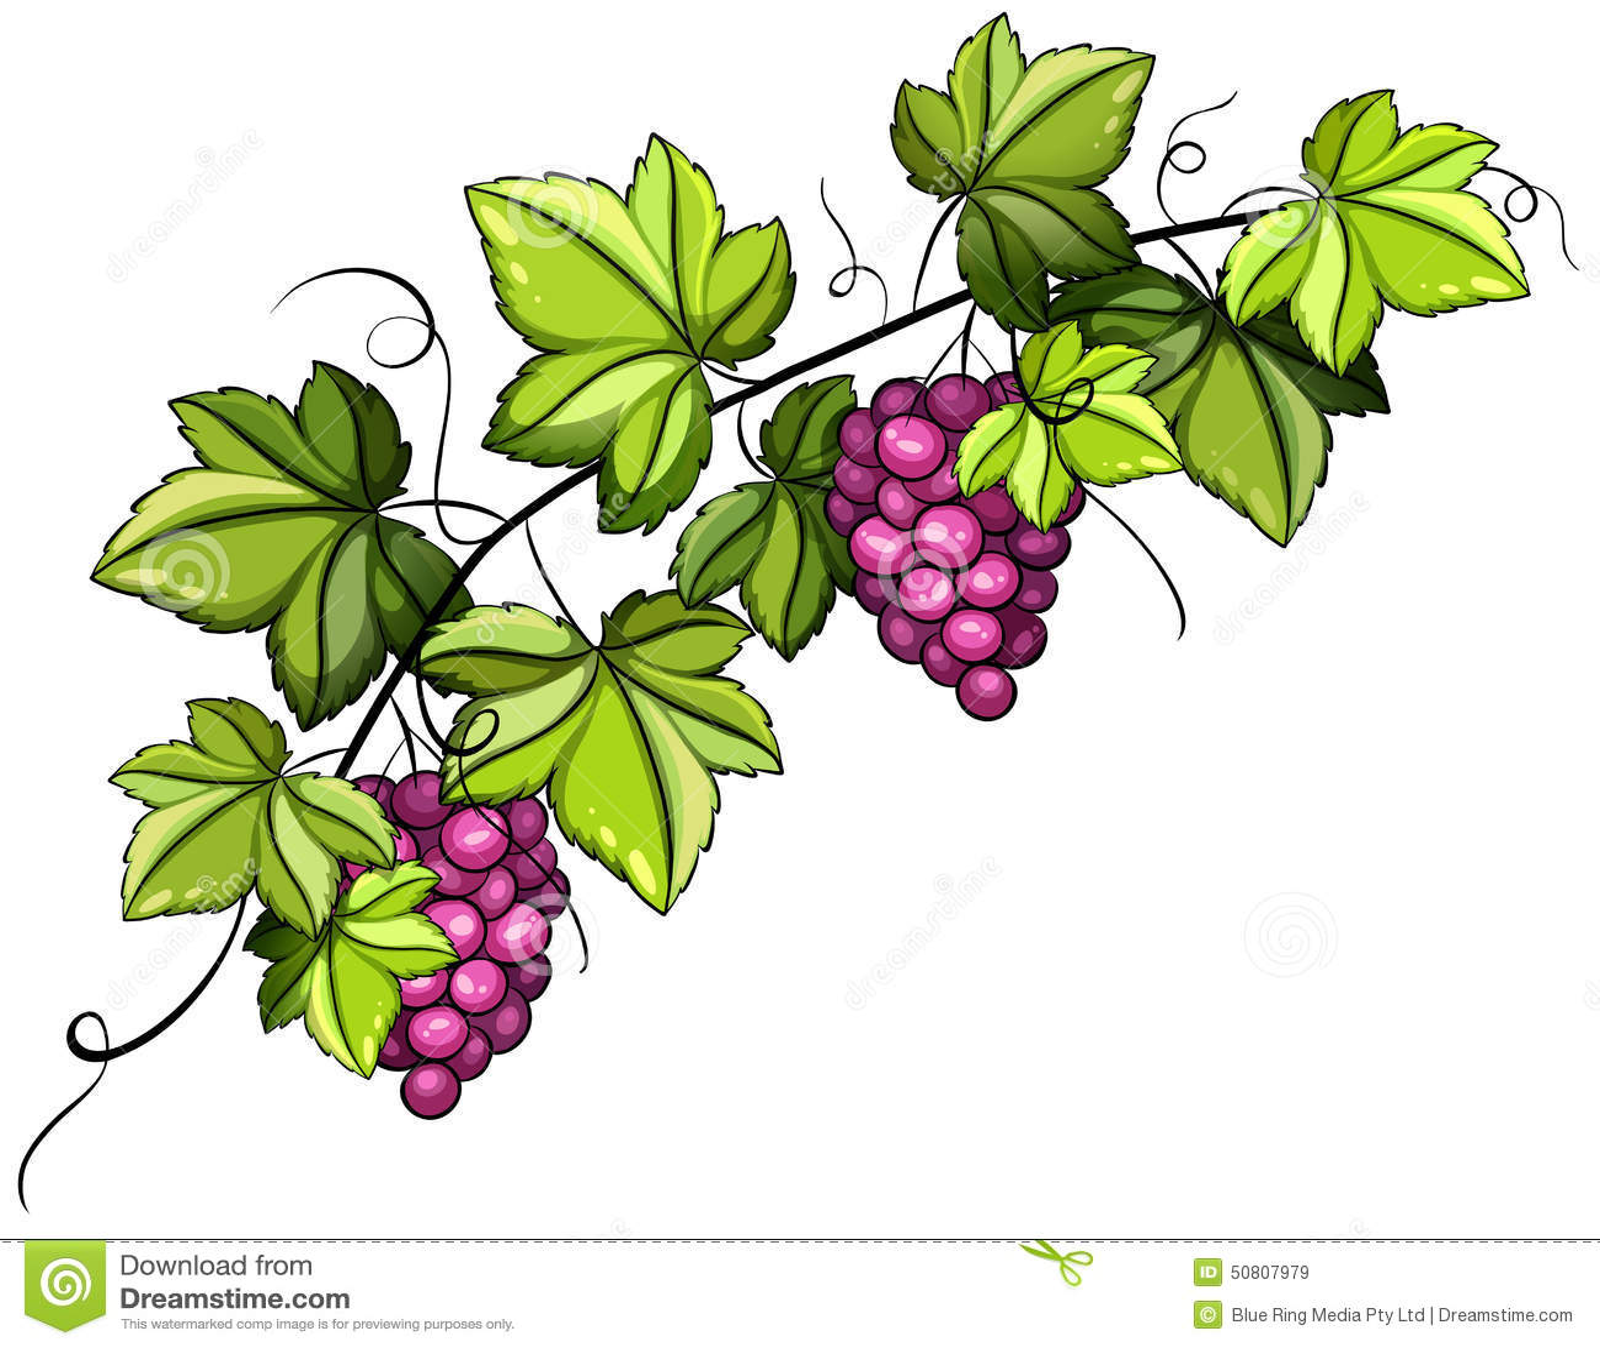 grapevine stock illustrations 4 542 grapevine stock illustrations rh dreamstime com grapevine wreath clip art grape vine clip art images